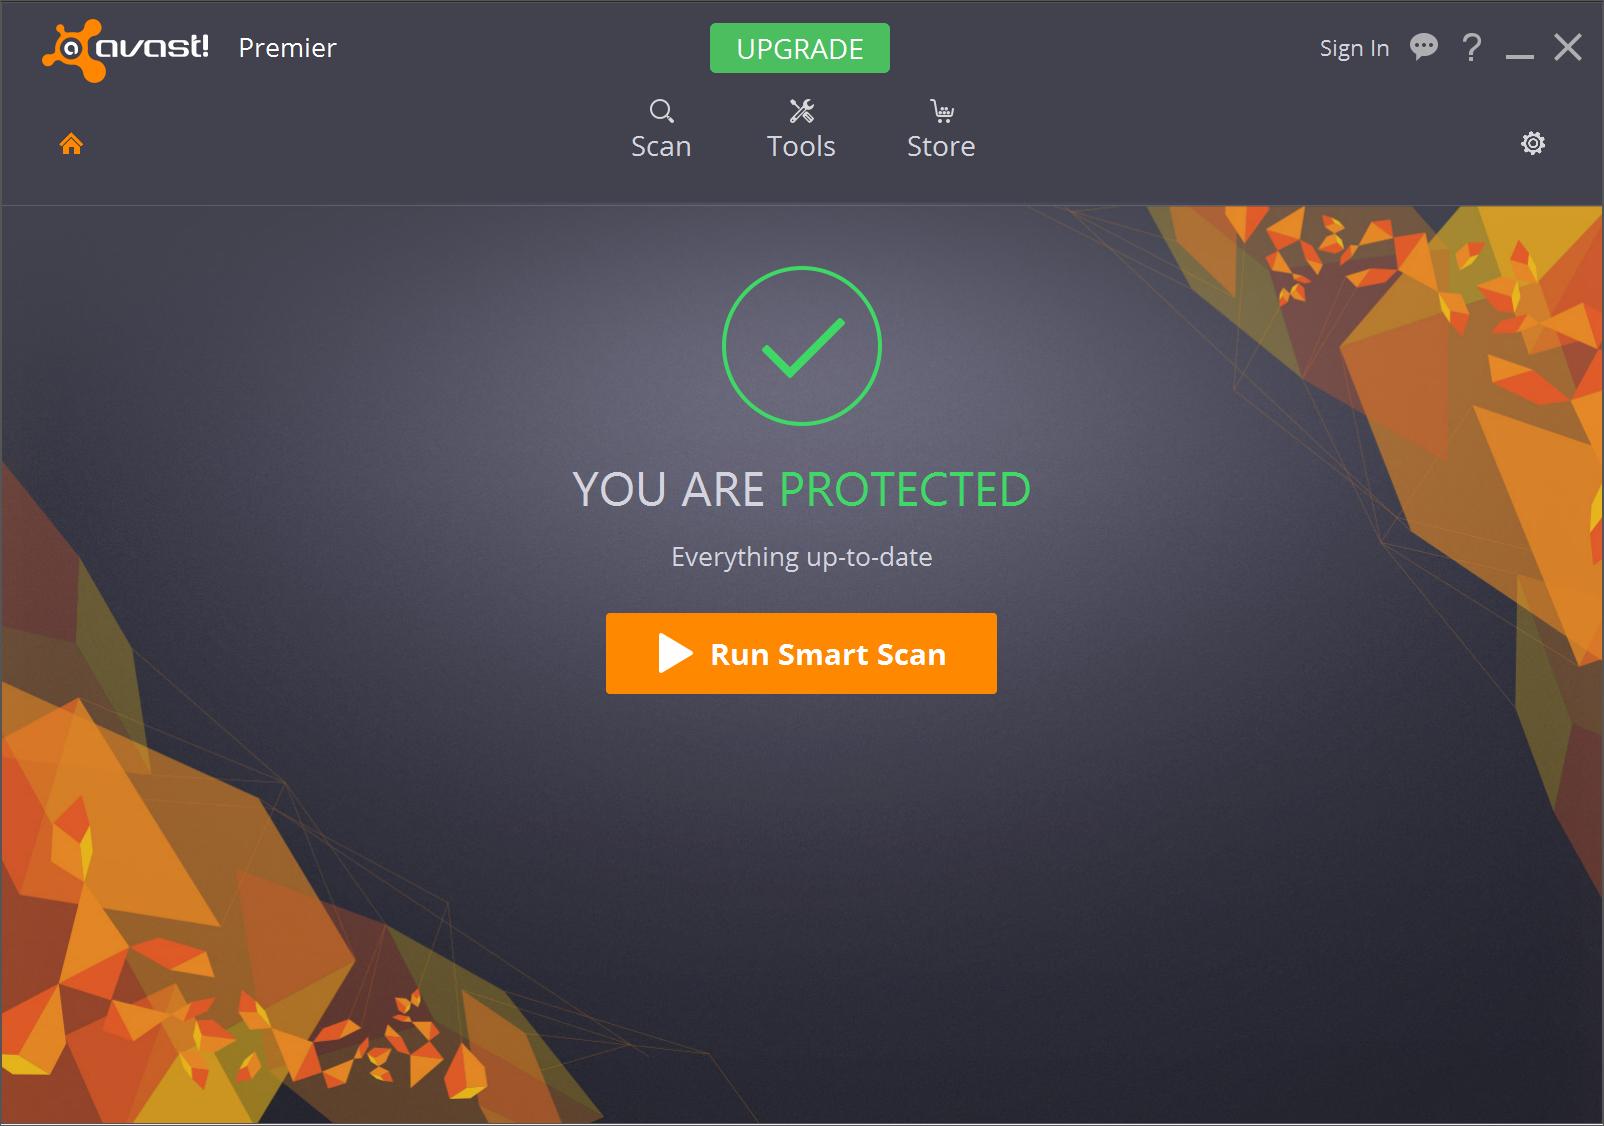 Avast Premier 2020 Crack + Activation Code Free (Till 2050)